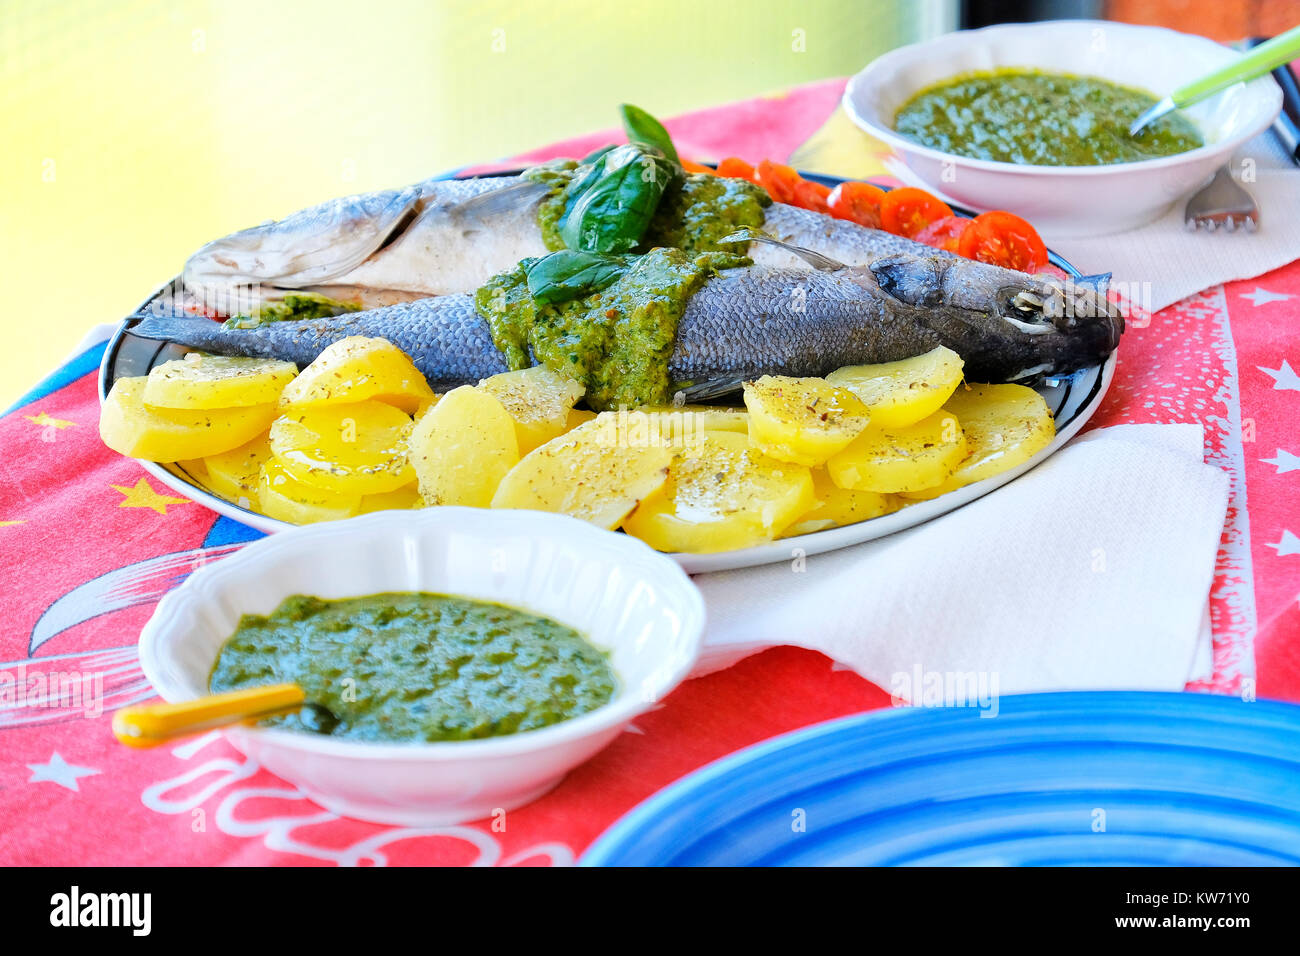 european sea bass branzino steaming potatoes tomatoes basil sauce recipe - Stock Image